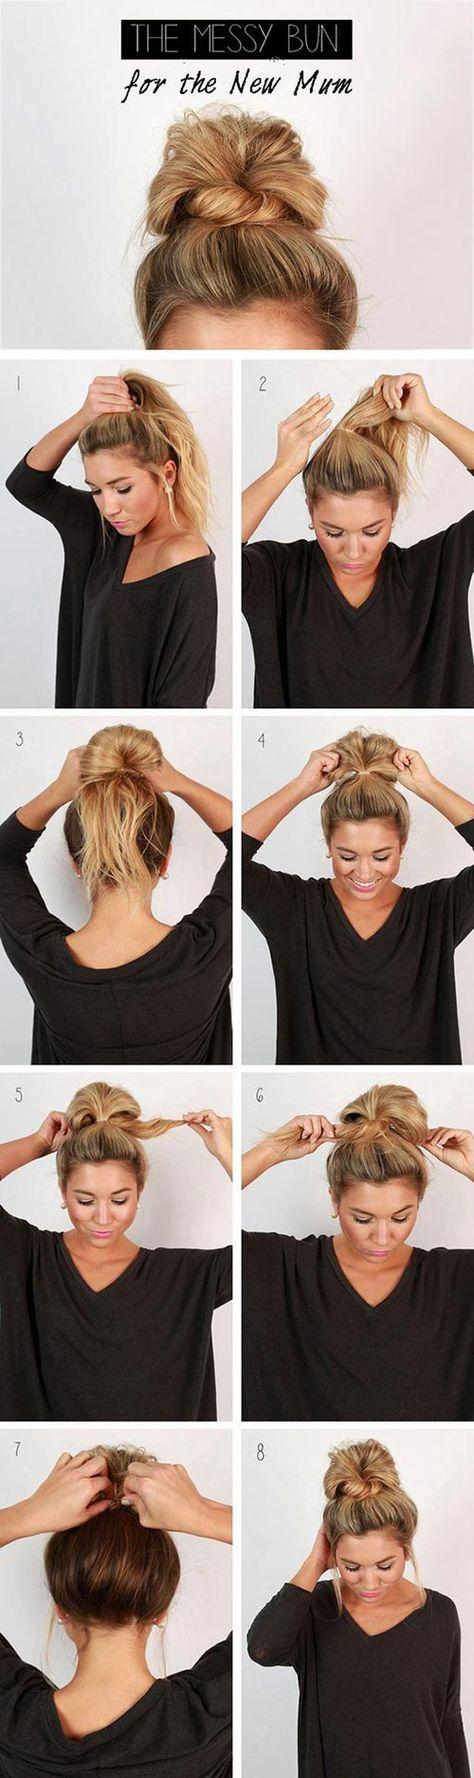 Top 10 Messy Updo Tutorials For Different Hair Lengths Hair Styles Long Hair Styles Medium Length Hair Styles